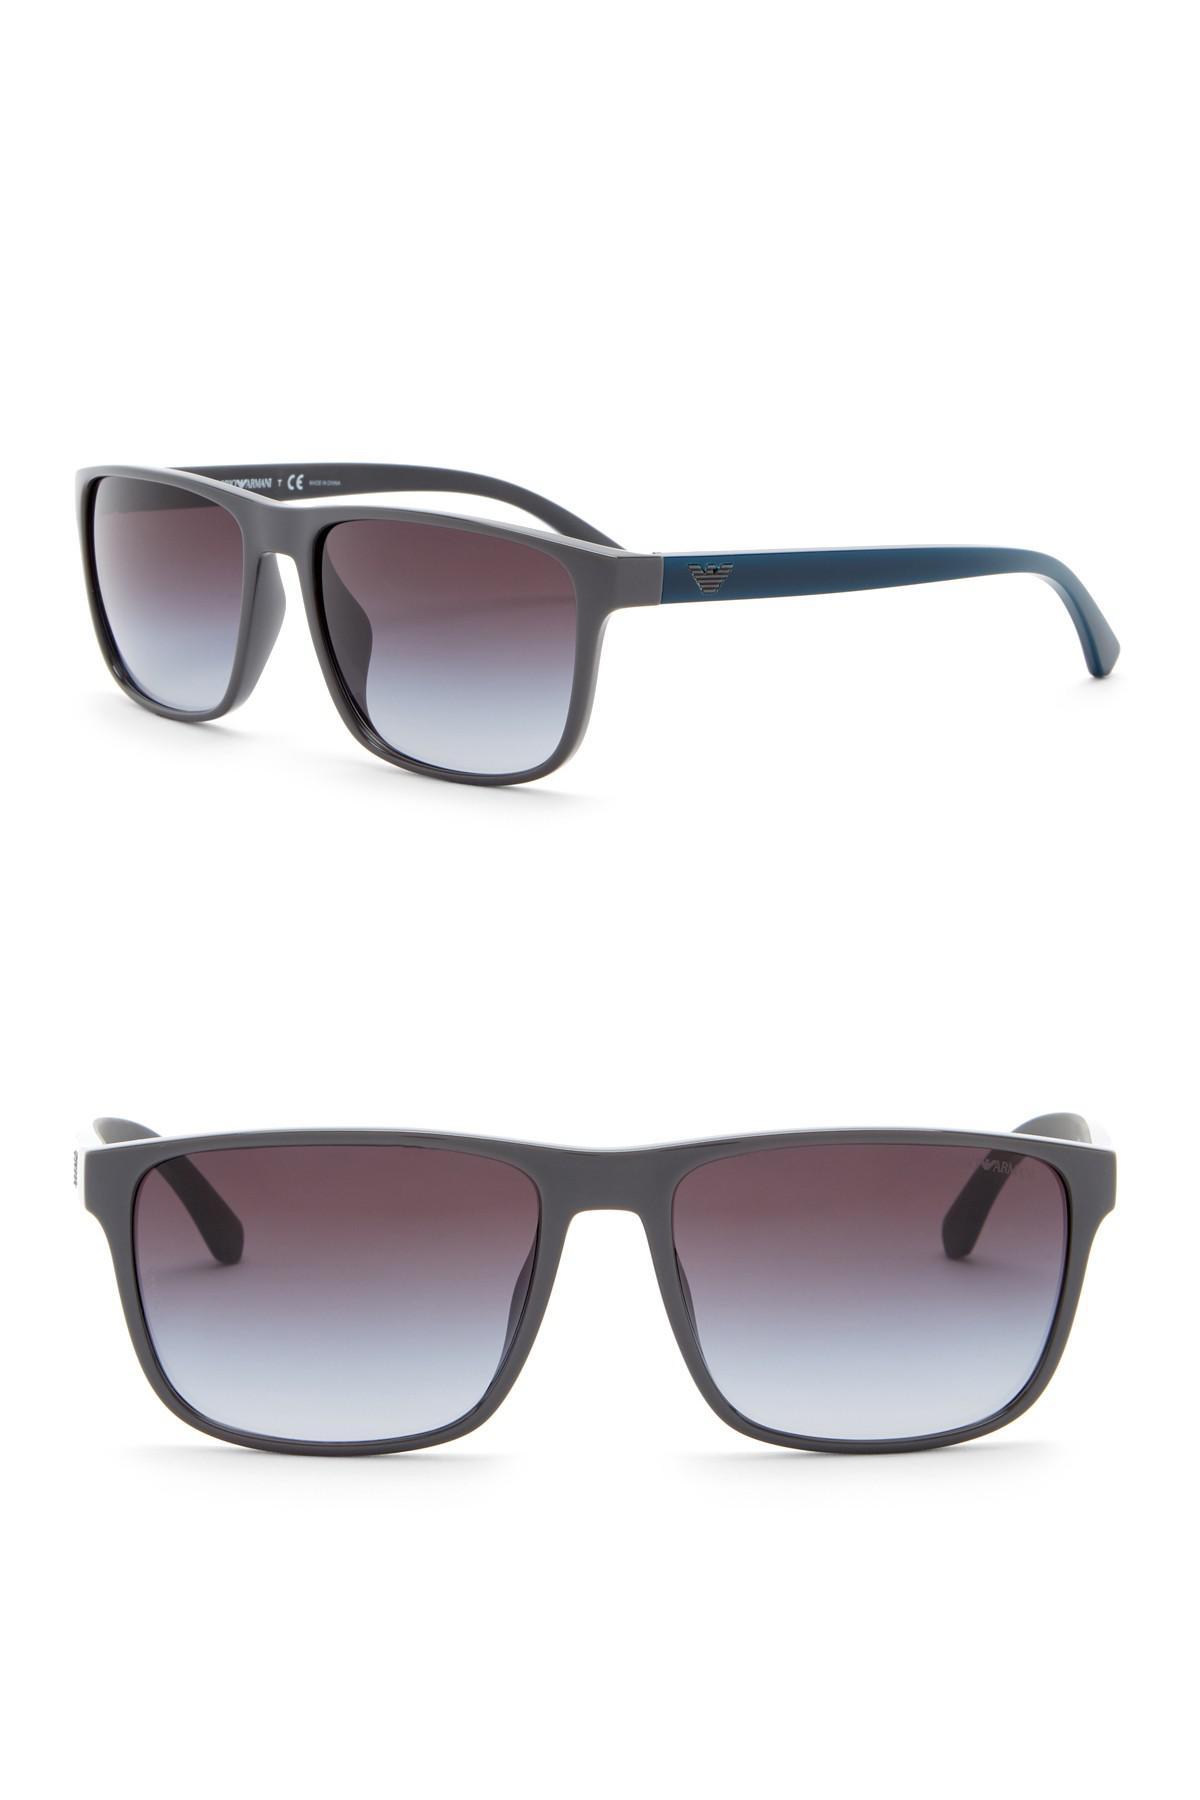 09941a5d1f65 Lyst - Emporio Armani 59mm Rectangle Acetate Frame Sunglasses in ...